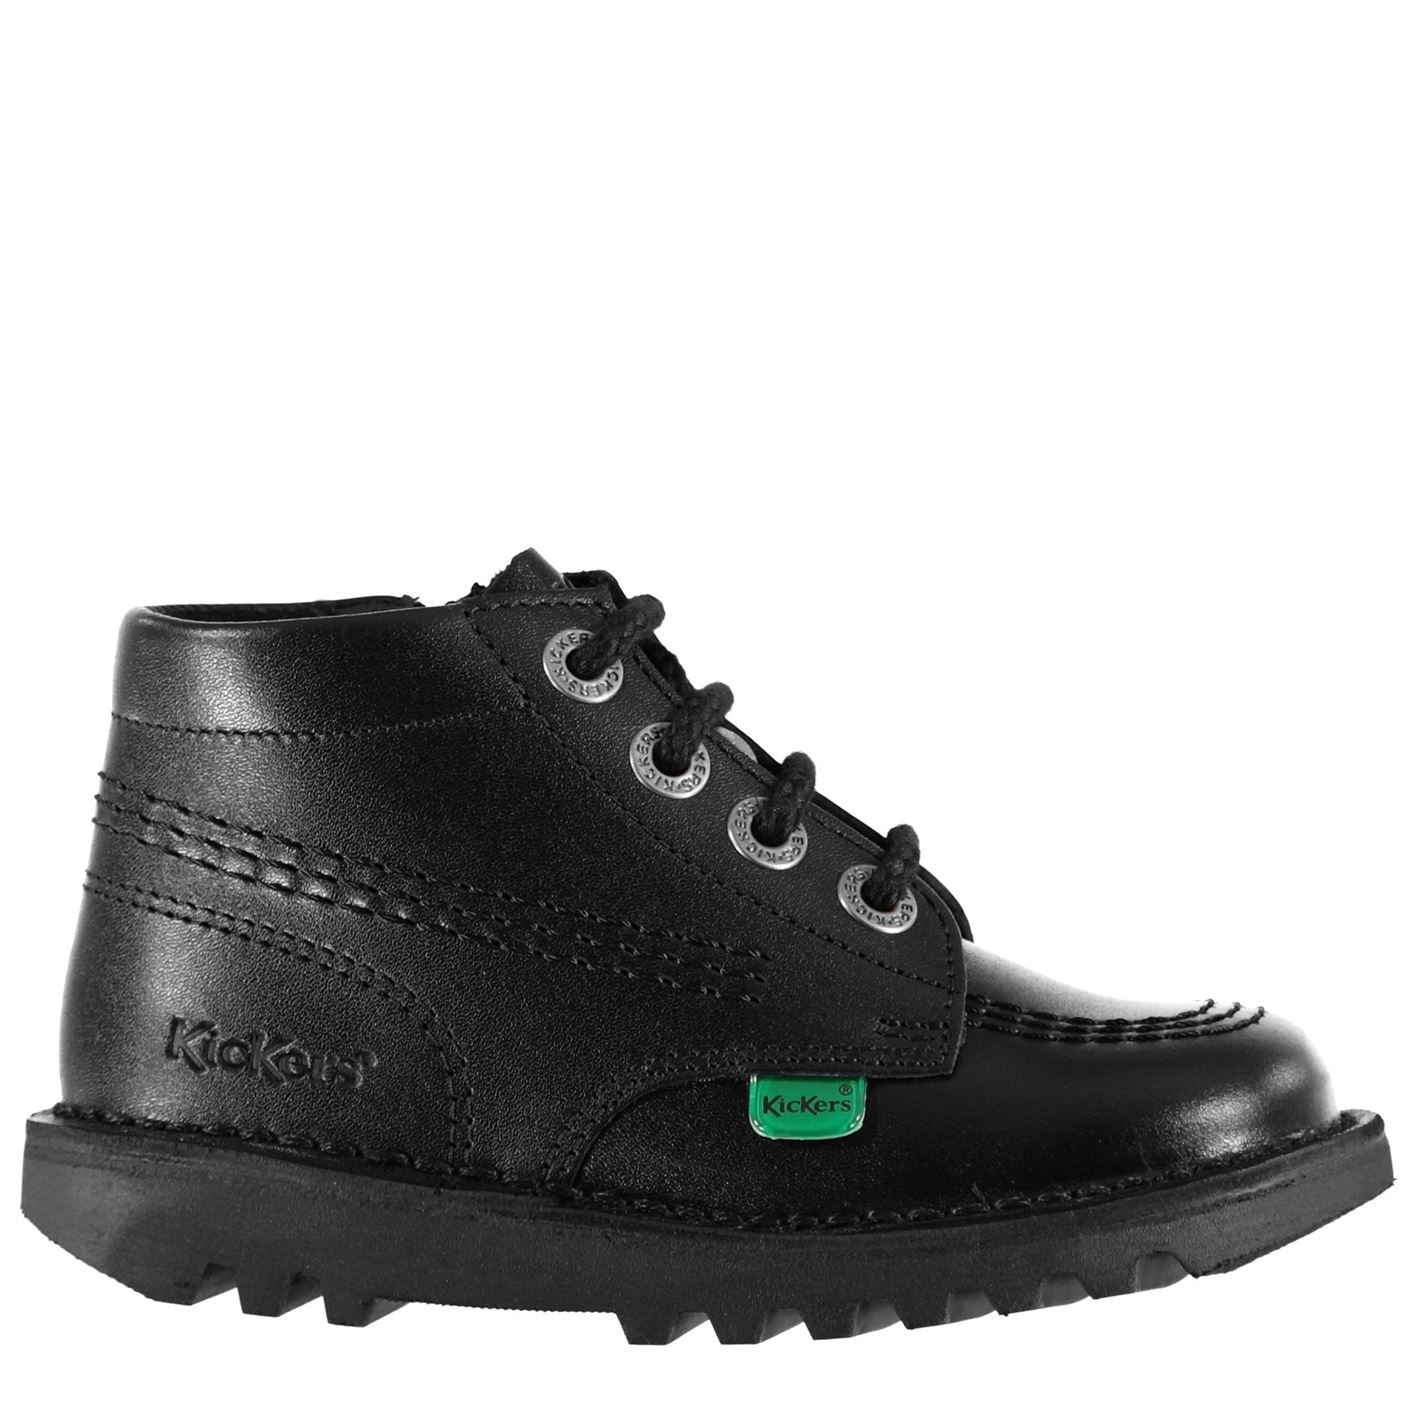 Kickers Kickers Infants Hi Boots Black leather